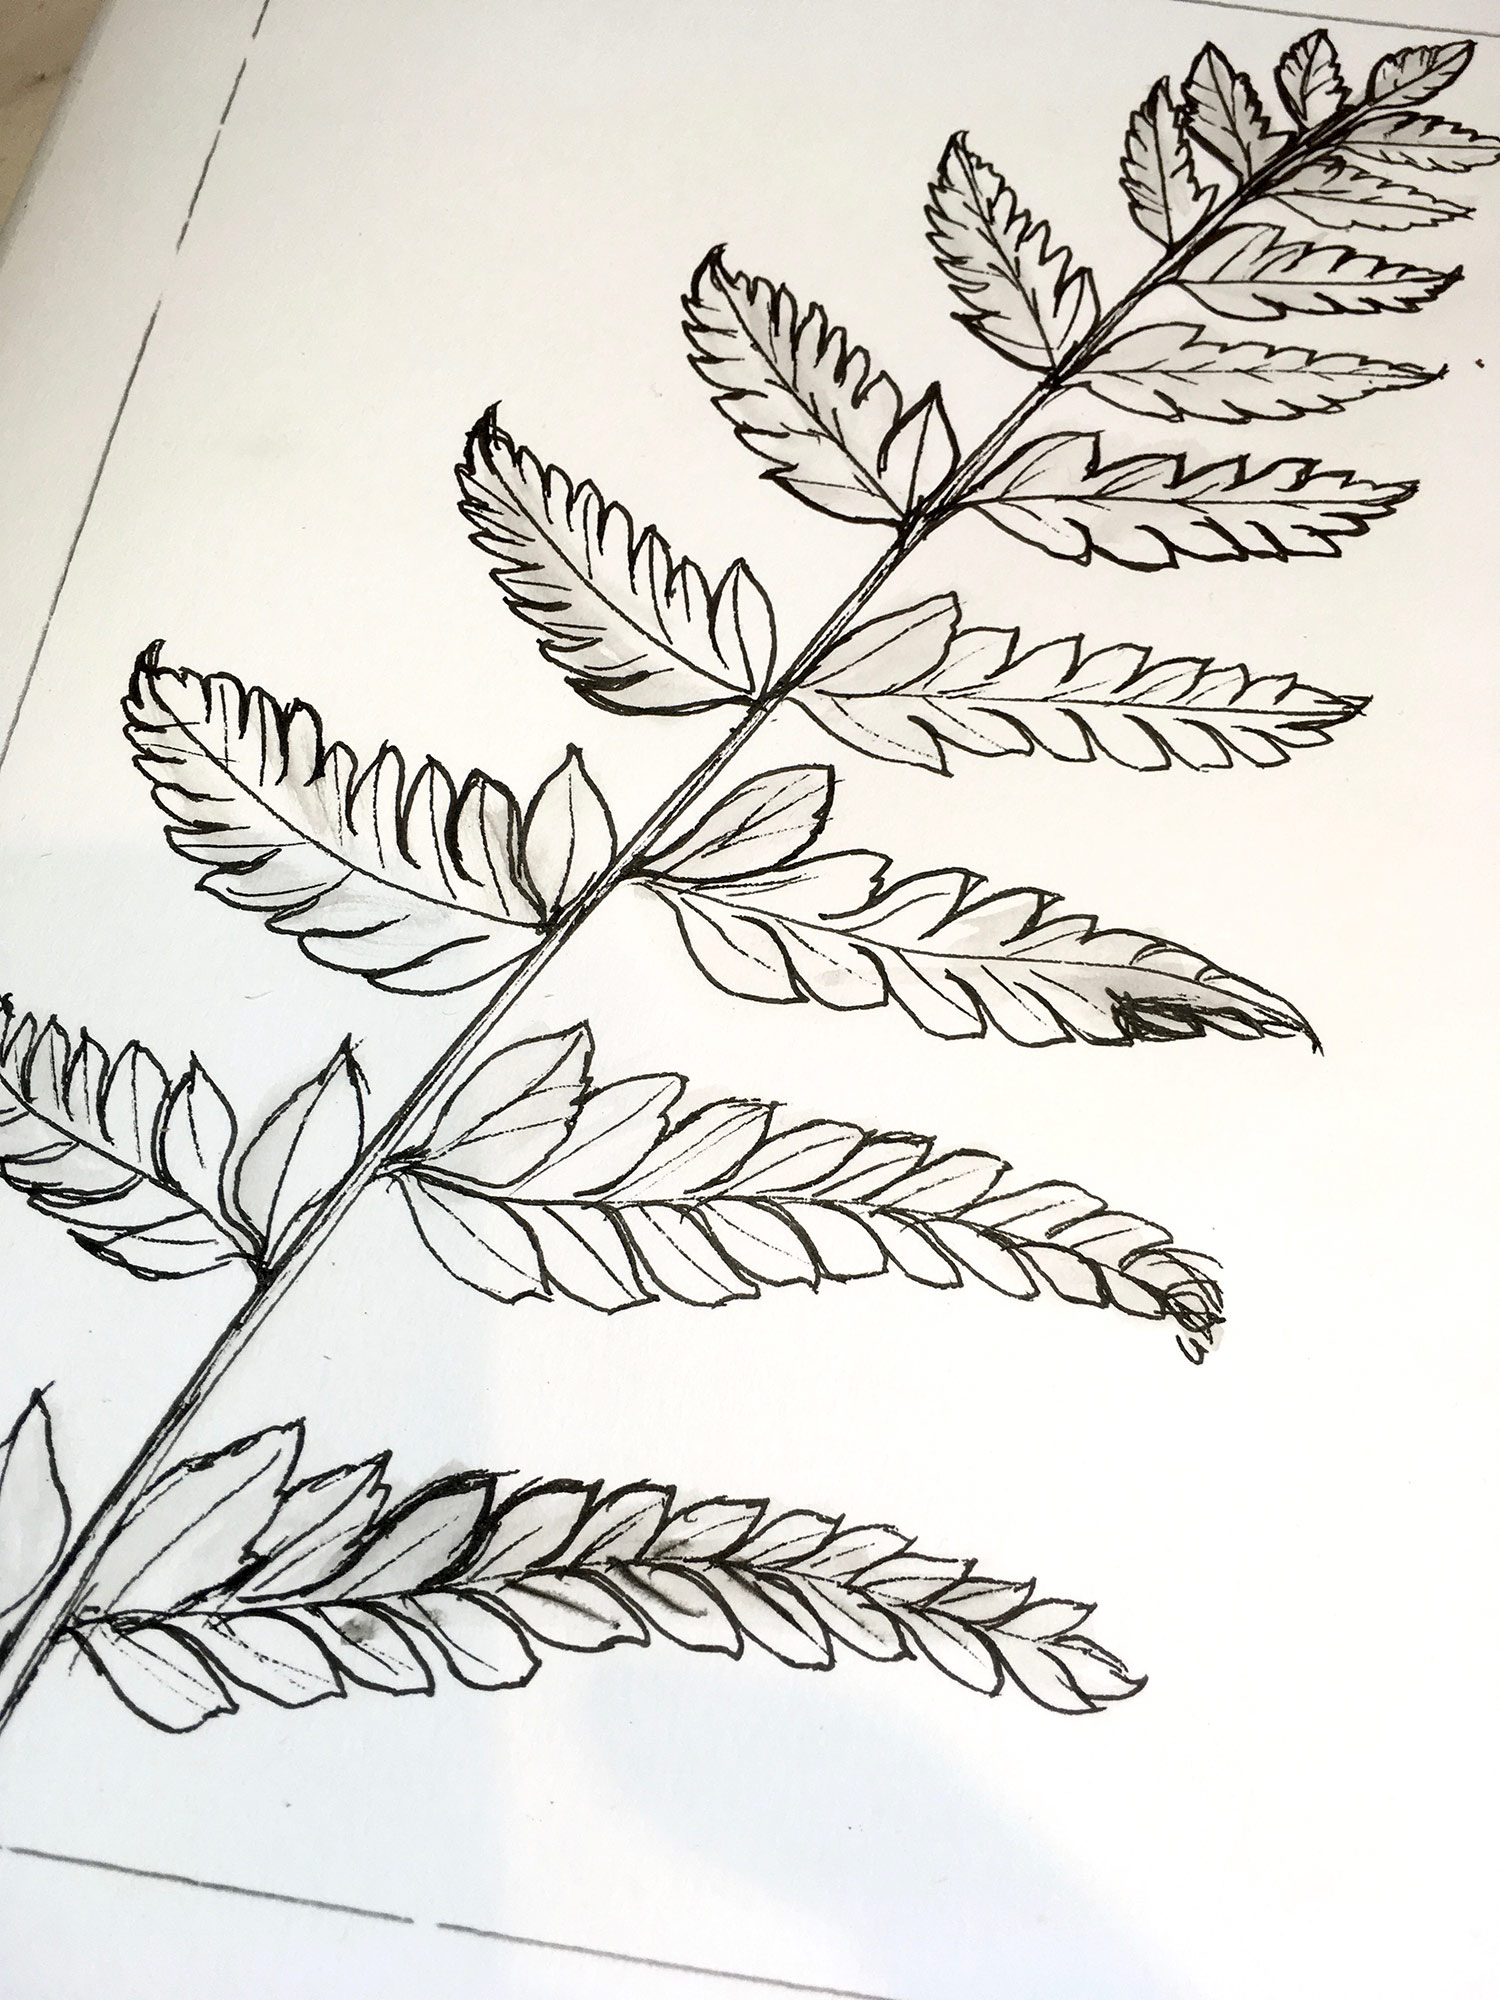 Fern Sketch (detail)